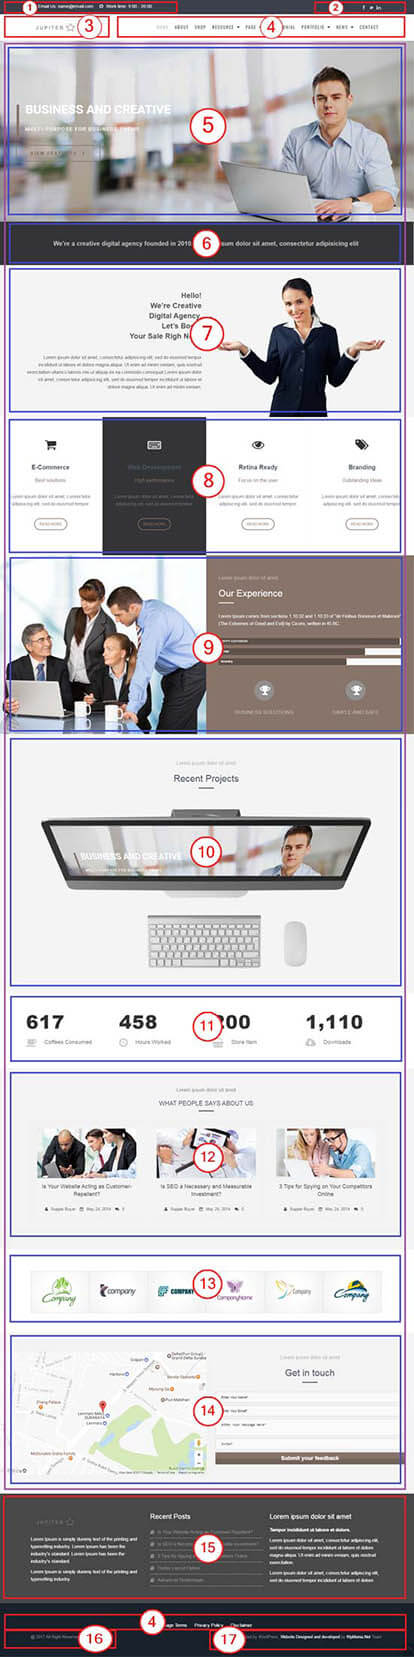 Jupiter Multi-Purpose WordPress Theme | Corporate Website Template Documentation